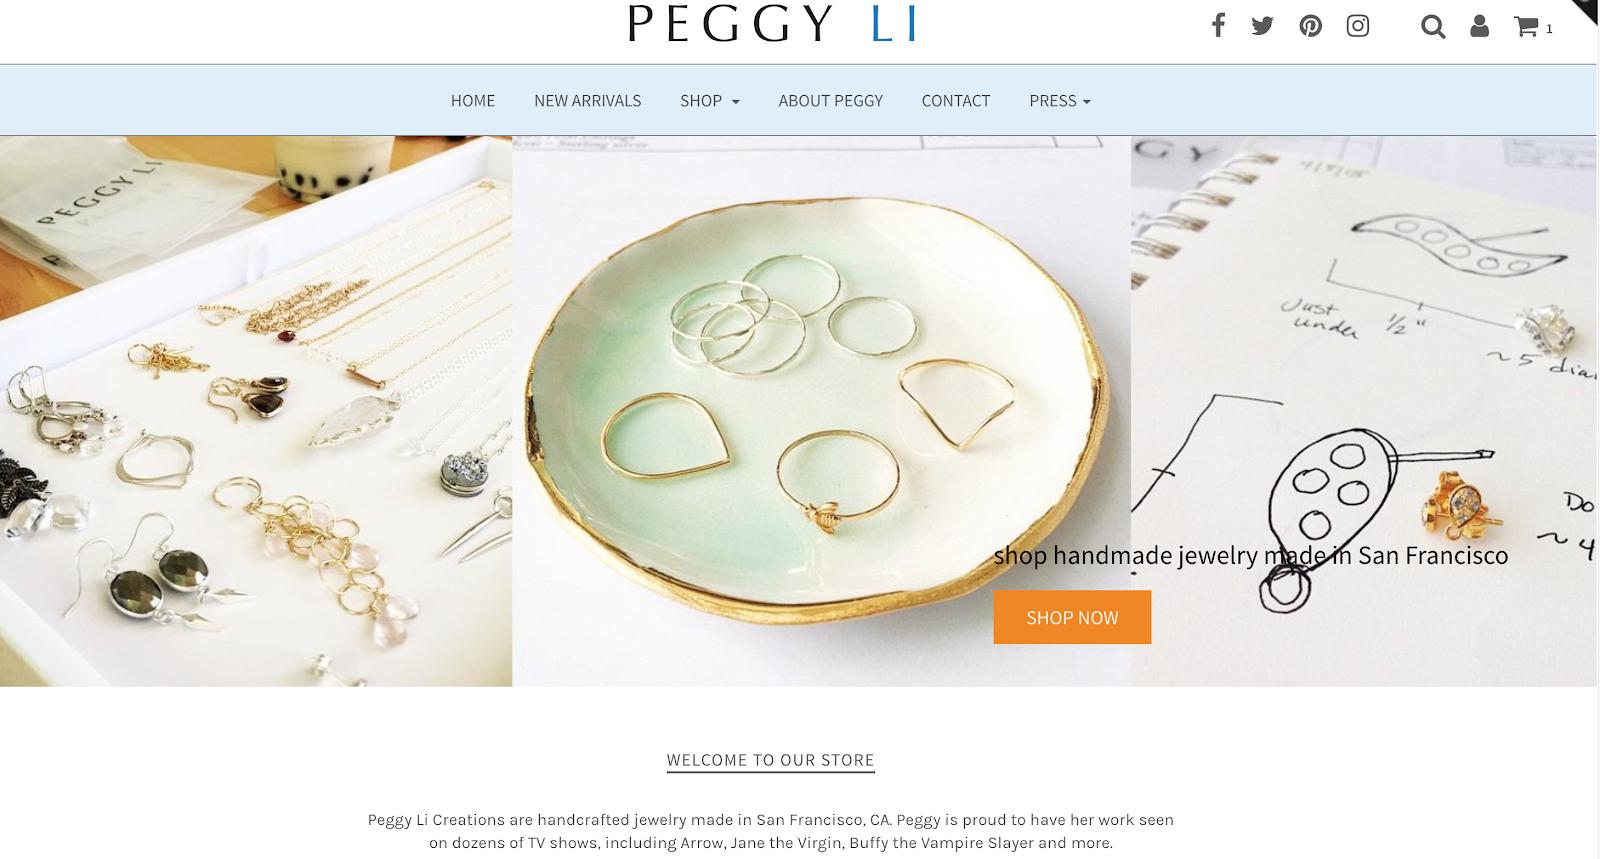 Peggy Li Creations Jewelry Blog on Feedspot - Rss Feed